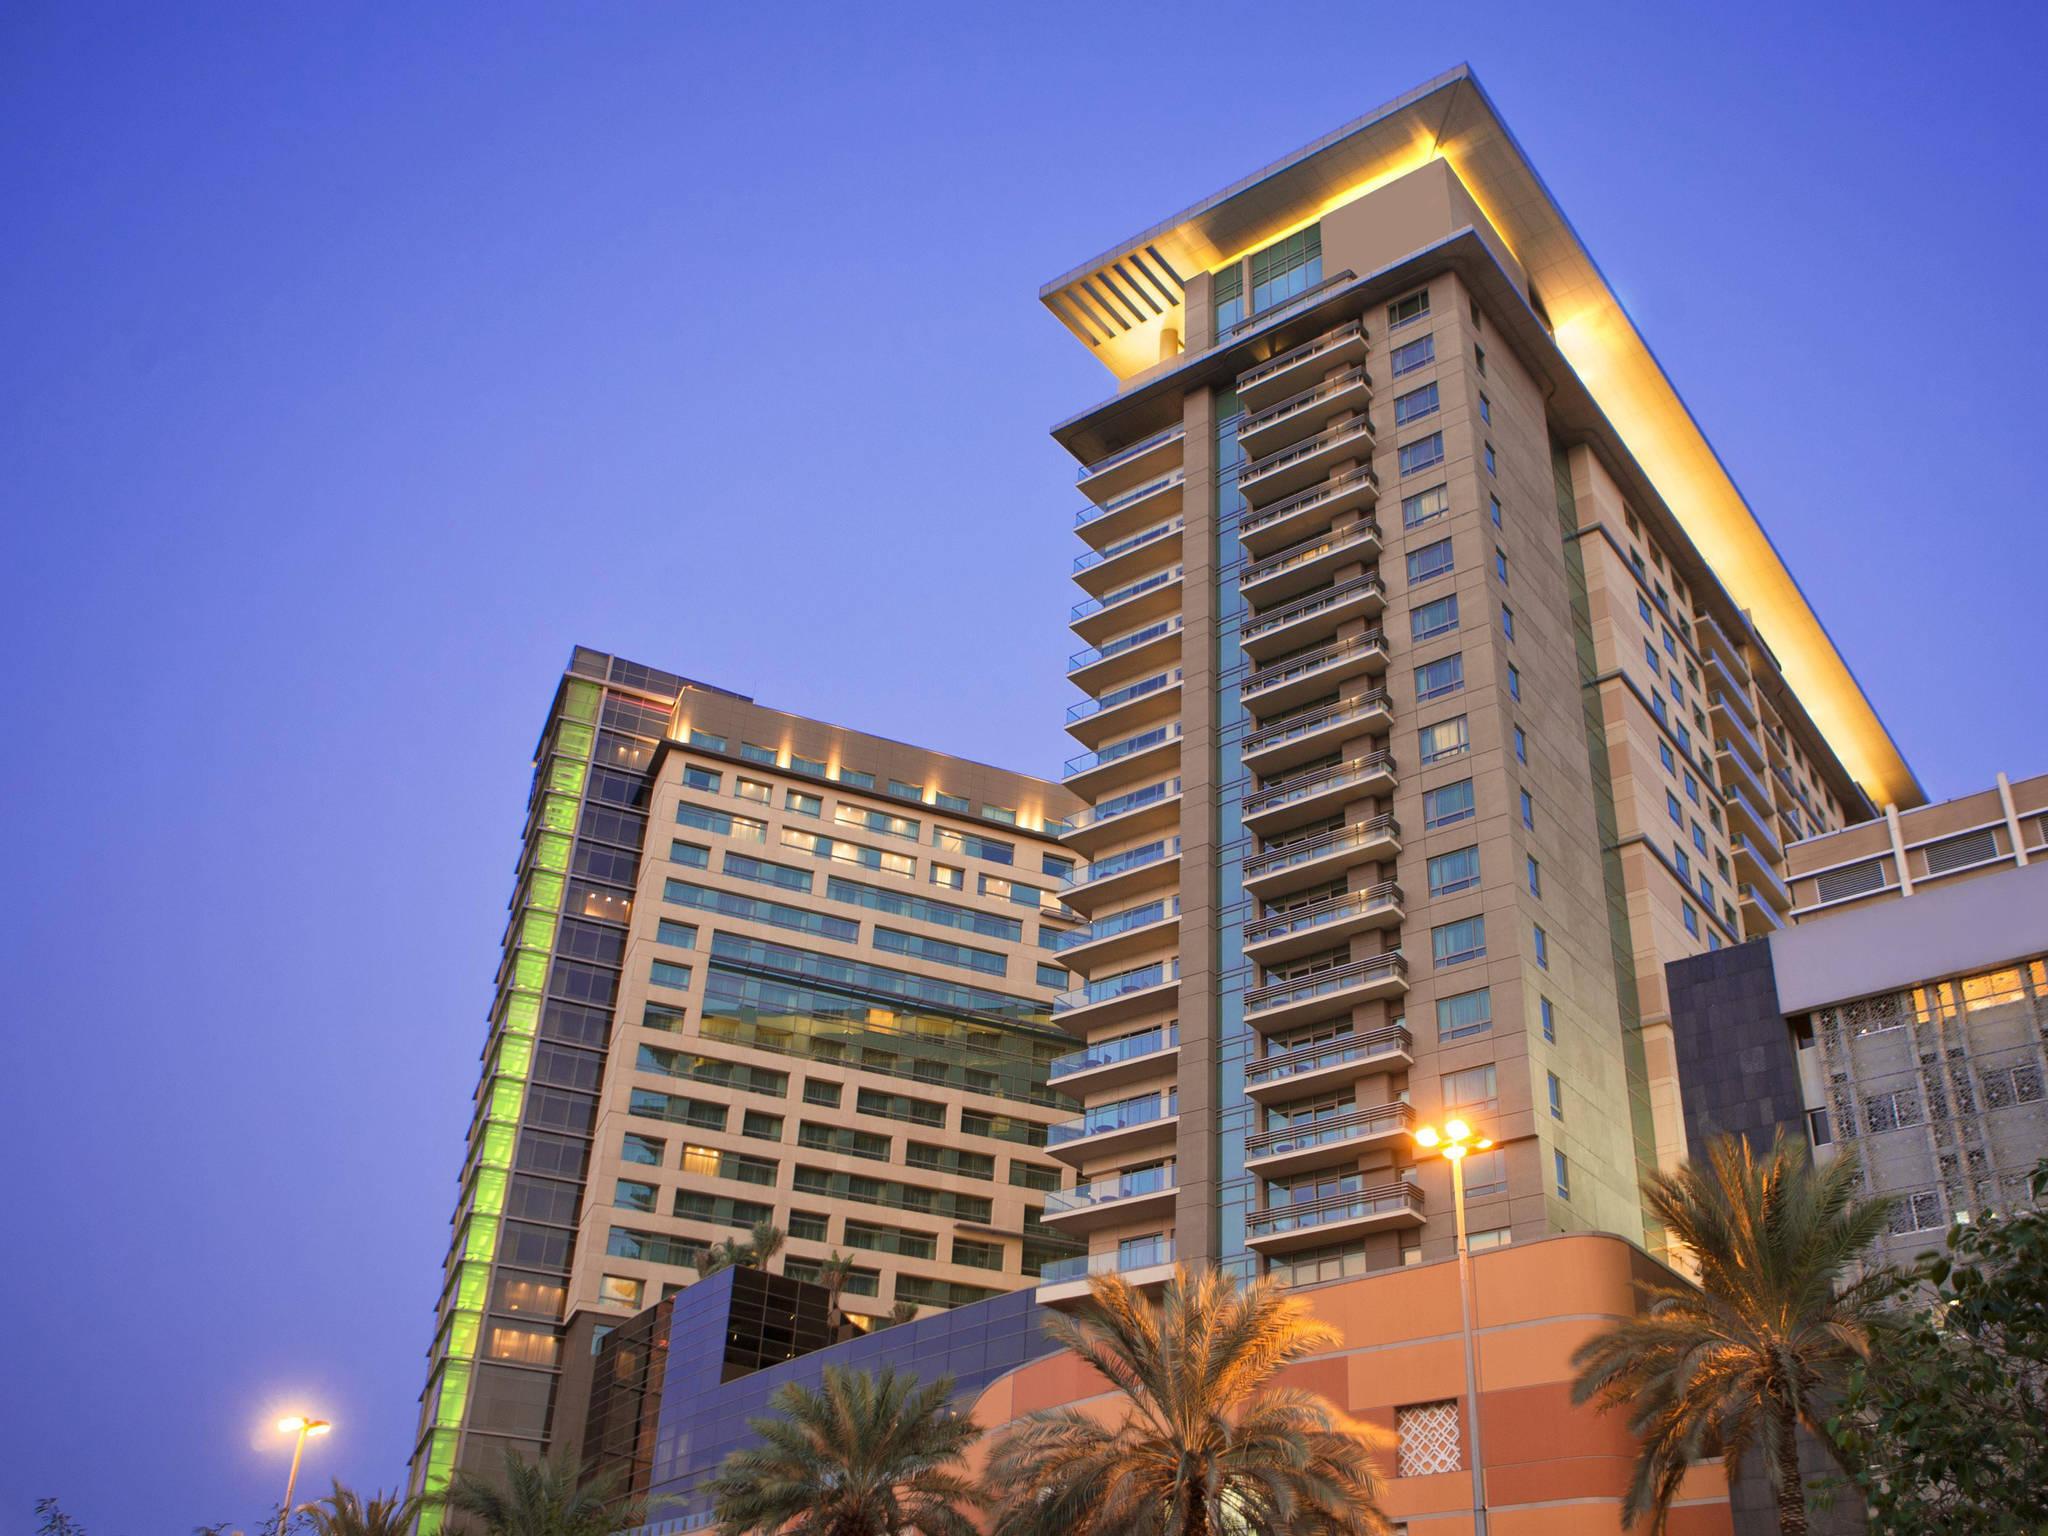 Otel – Accorhotels'in İşlettiği Al Ghurair Living (Açılış: Temmuz 2017)